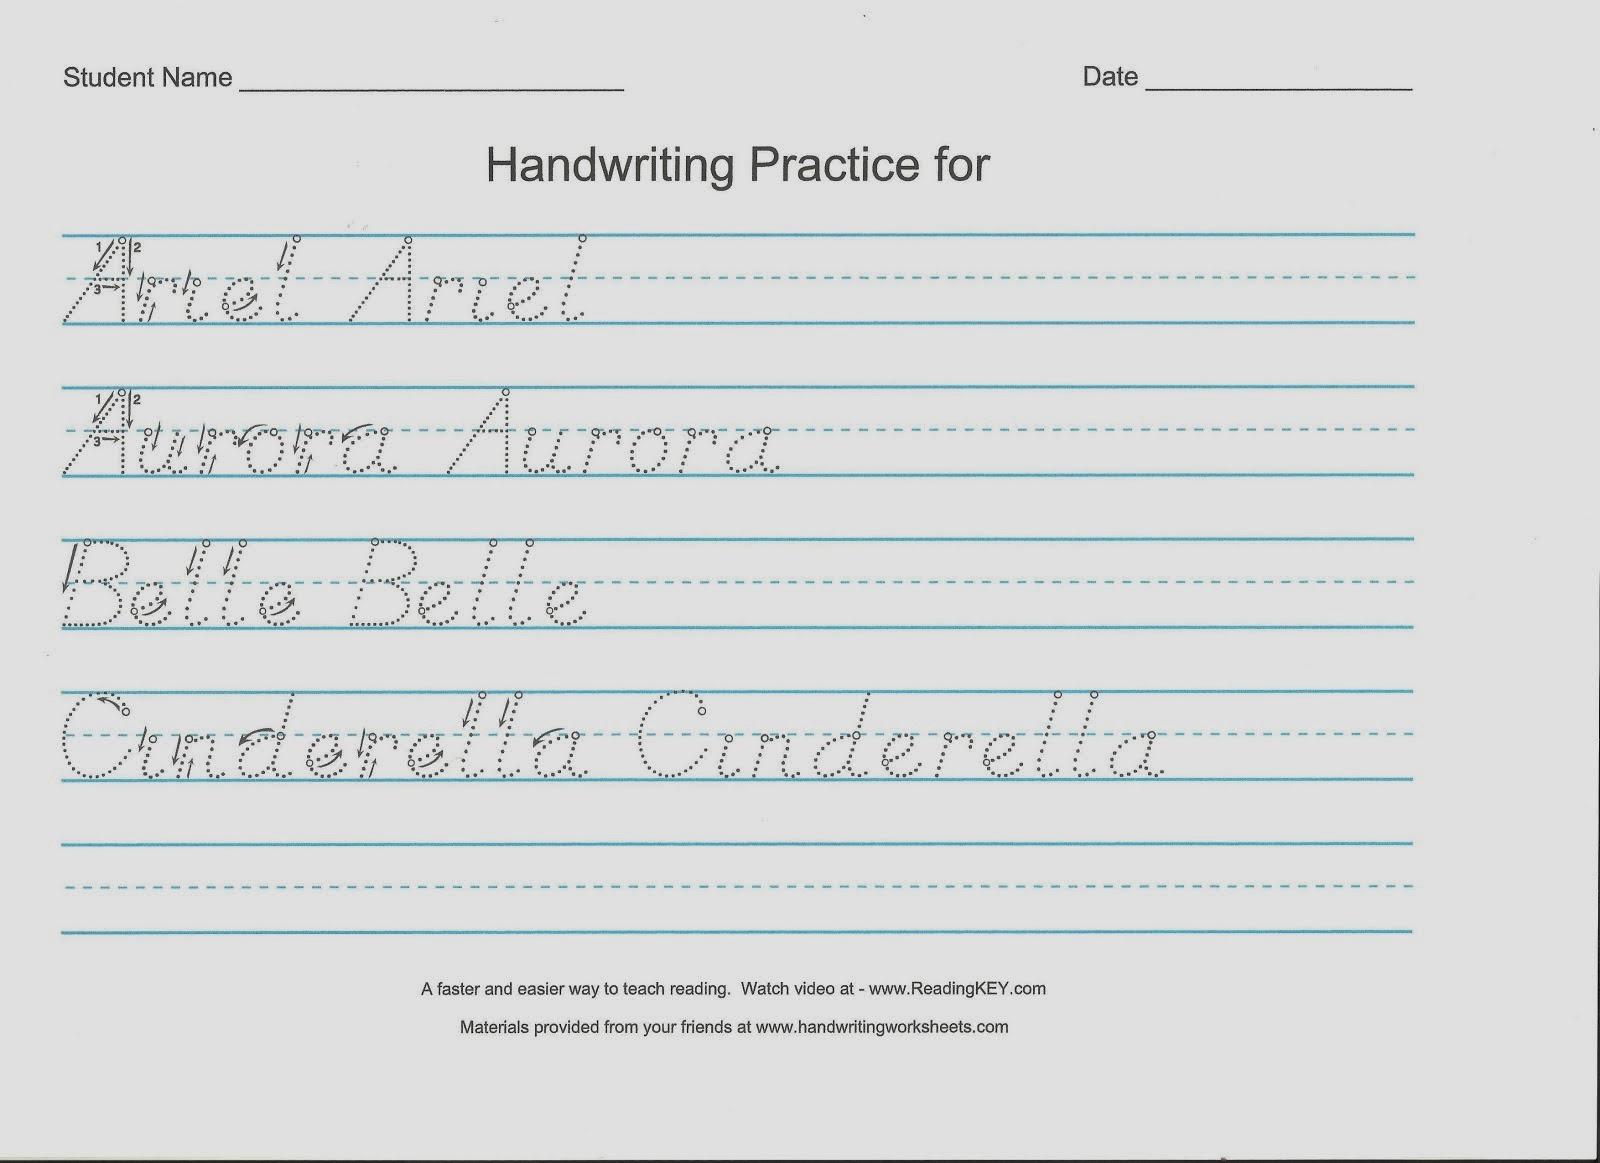 Worksheets Cursive Sentence Writing Practice worksheet cursive sentences yaqutlab free practice wosenly homework sheets writing apk downloader